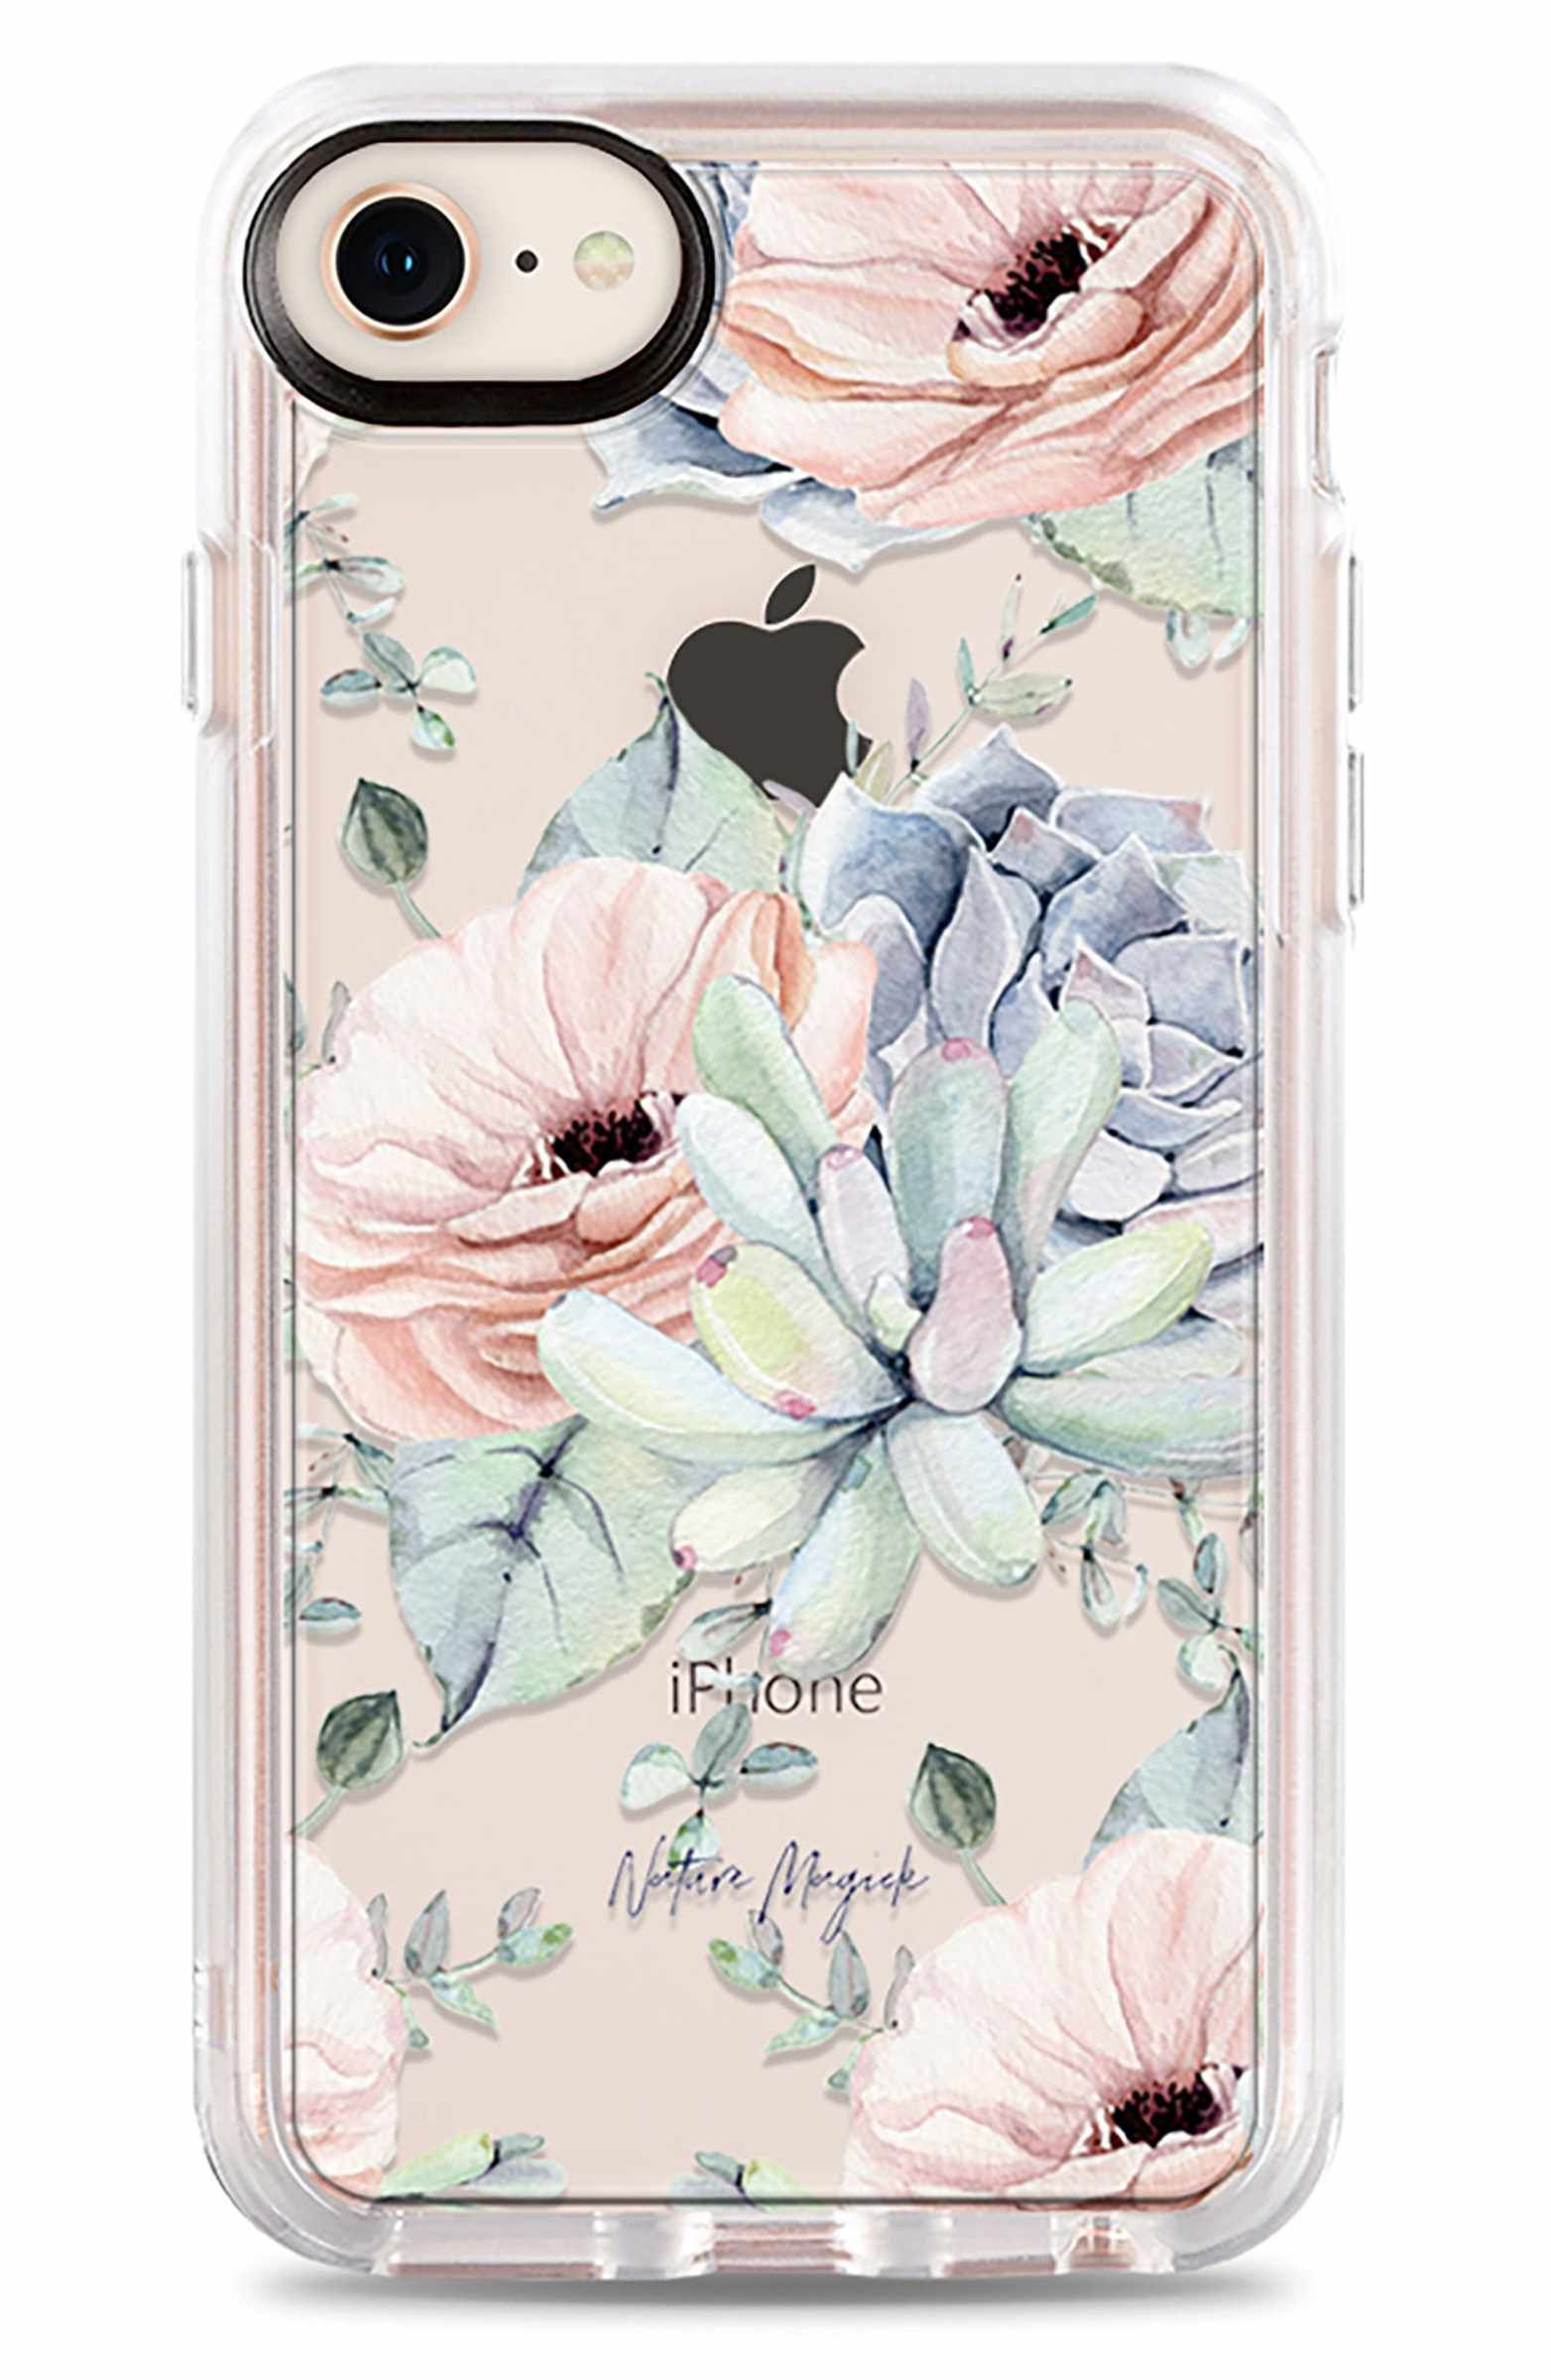 a9849633a Main Image - Casetify Pretty Succulents iPhone 7/8 & 7/8 Plus Case ...